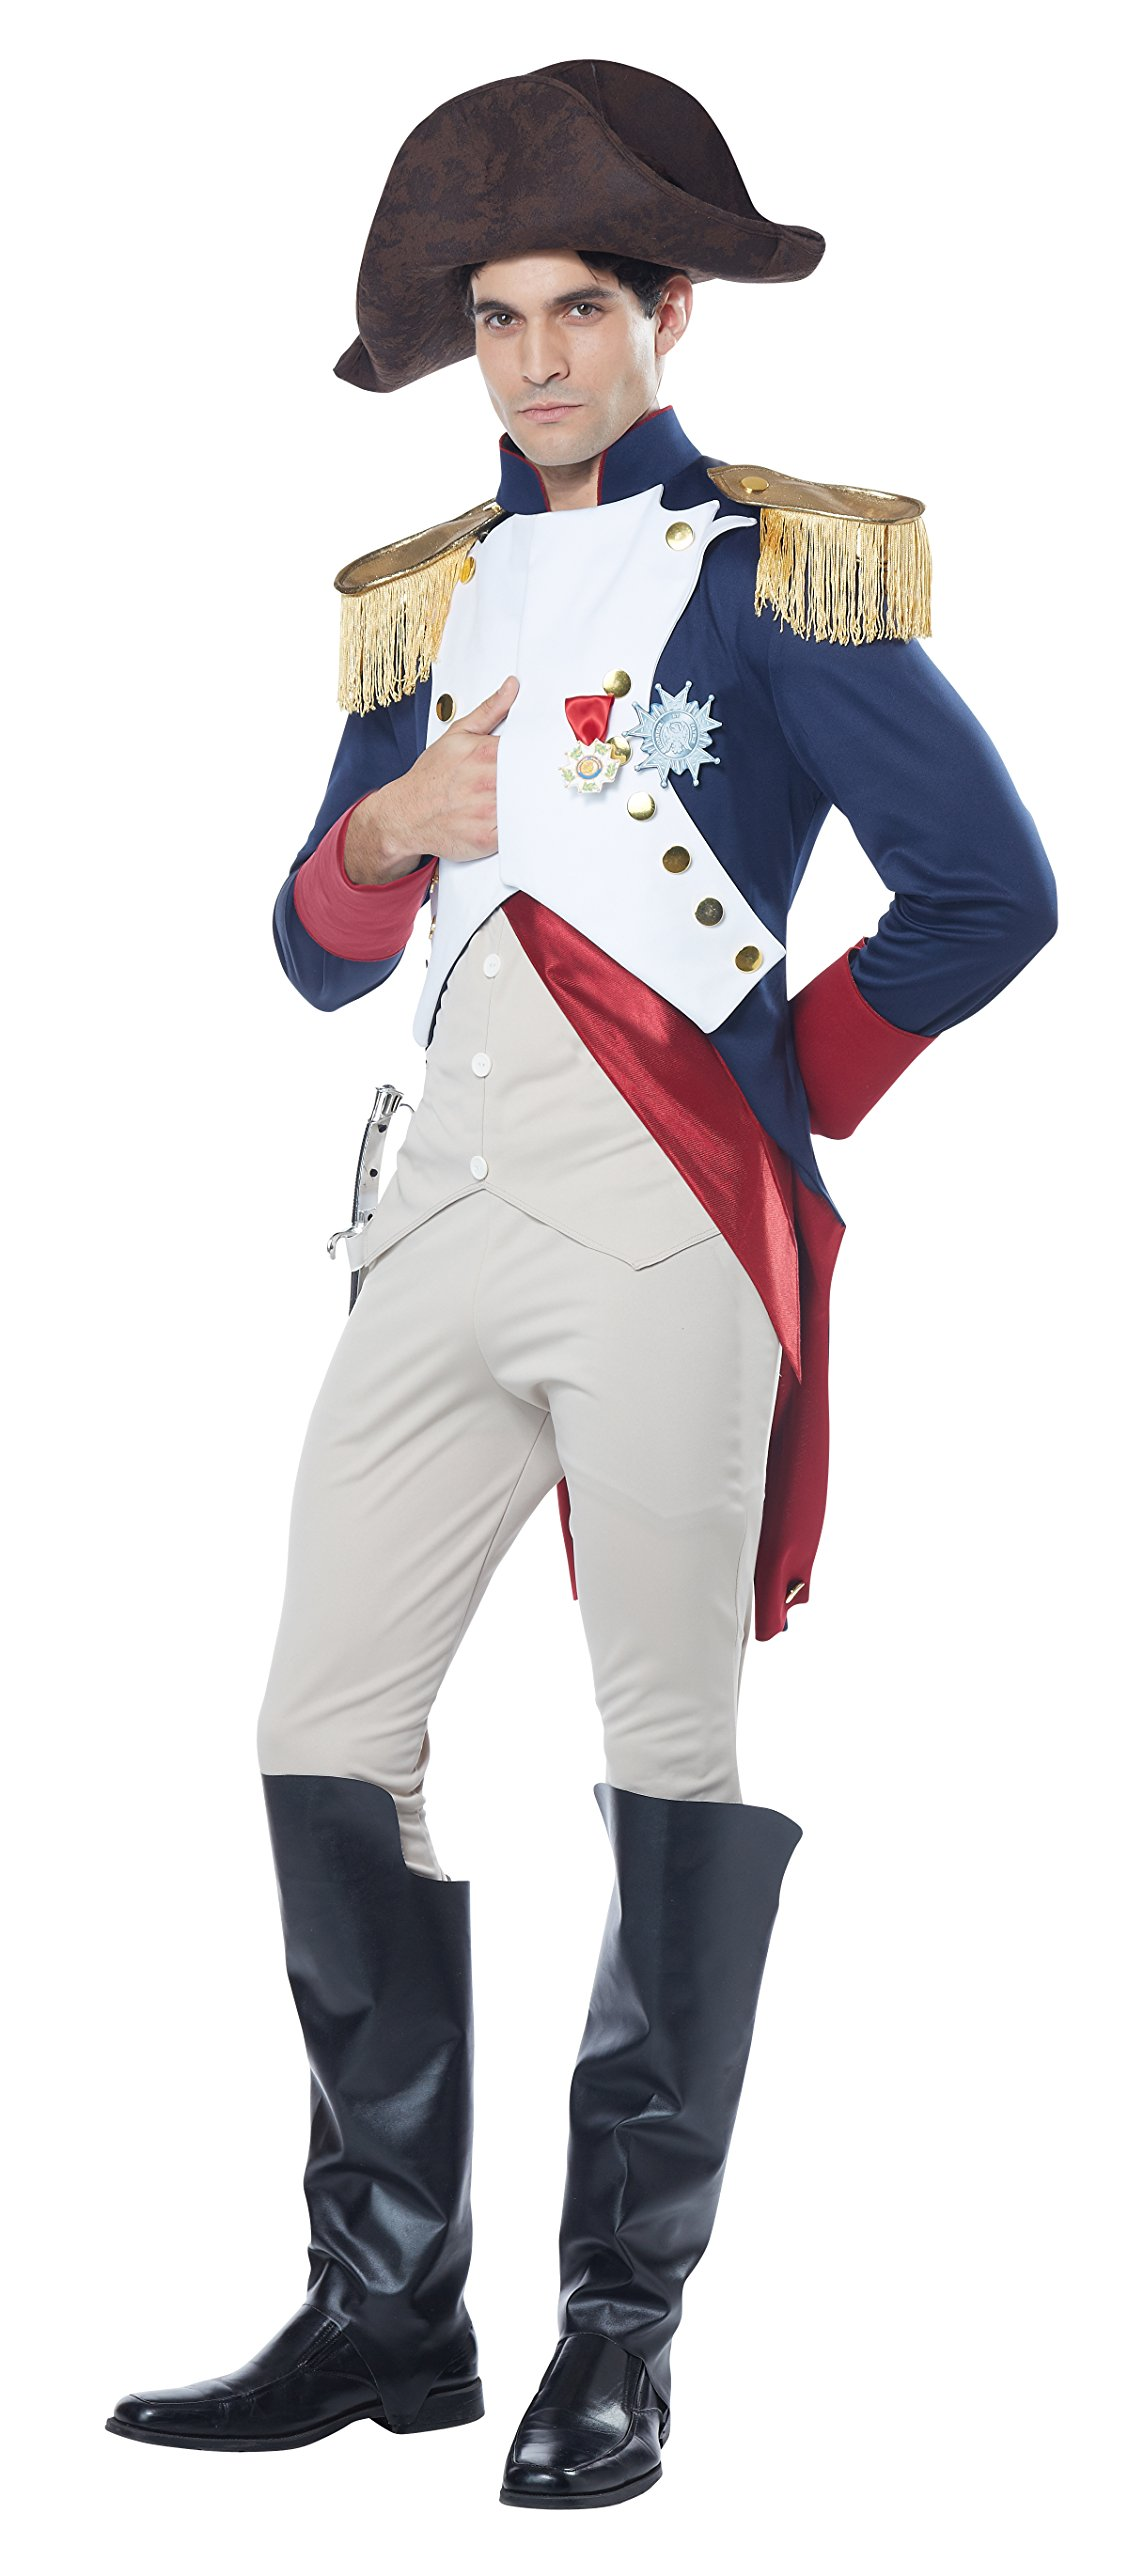 California Costumes Men's Napoleon French Emperor Costume, Multi, Small by California Costumes